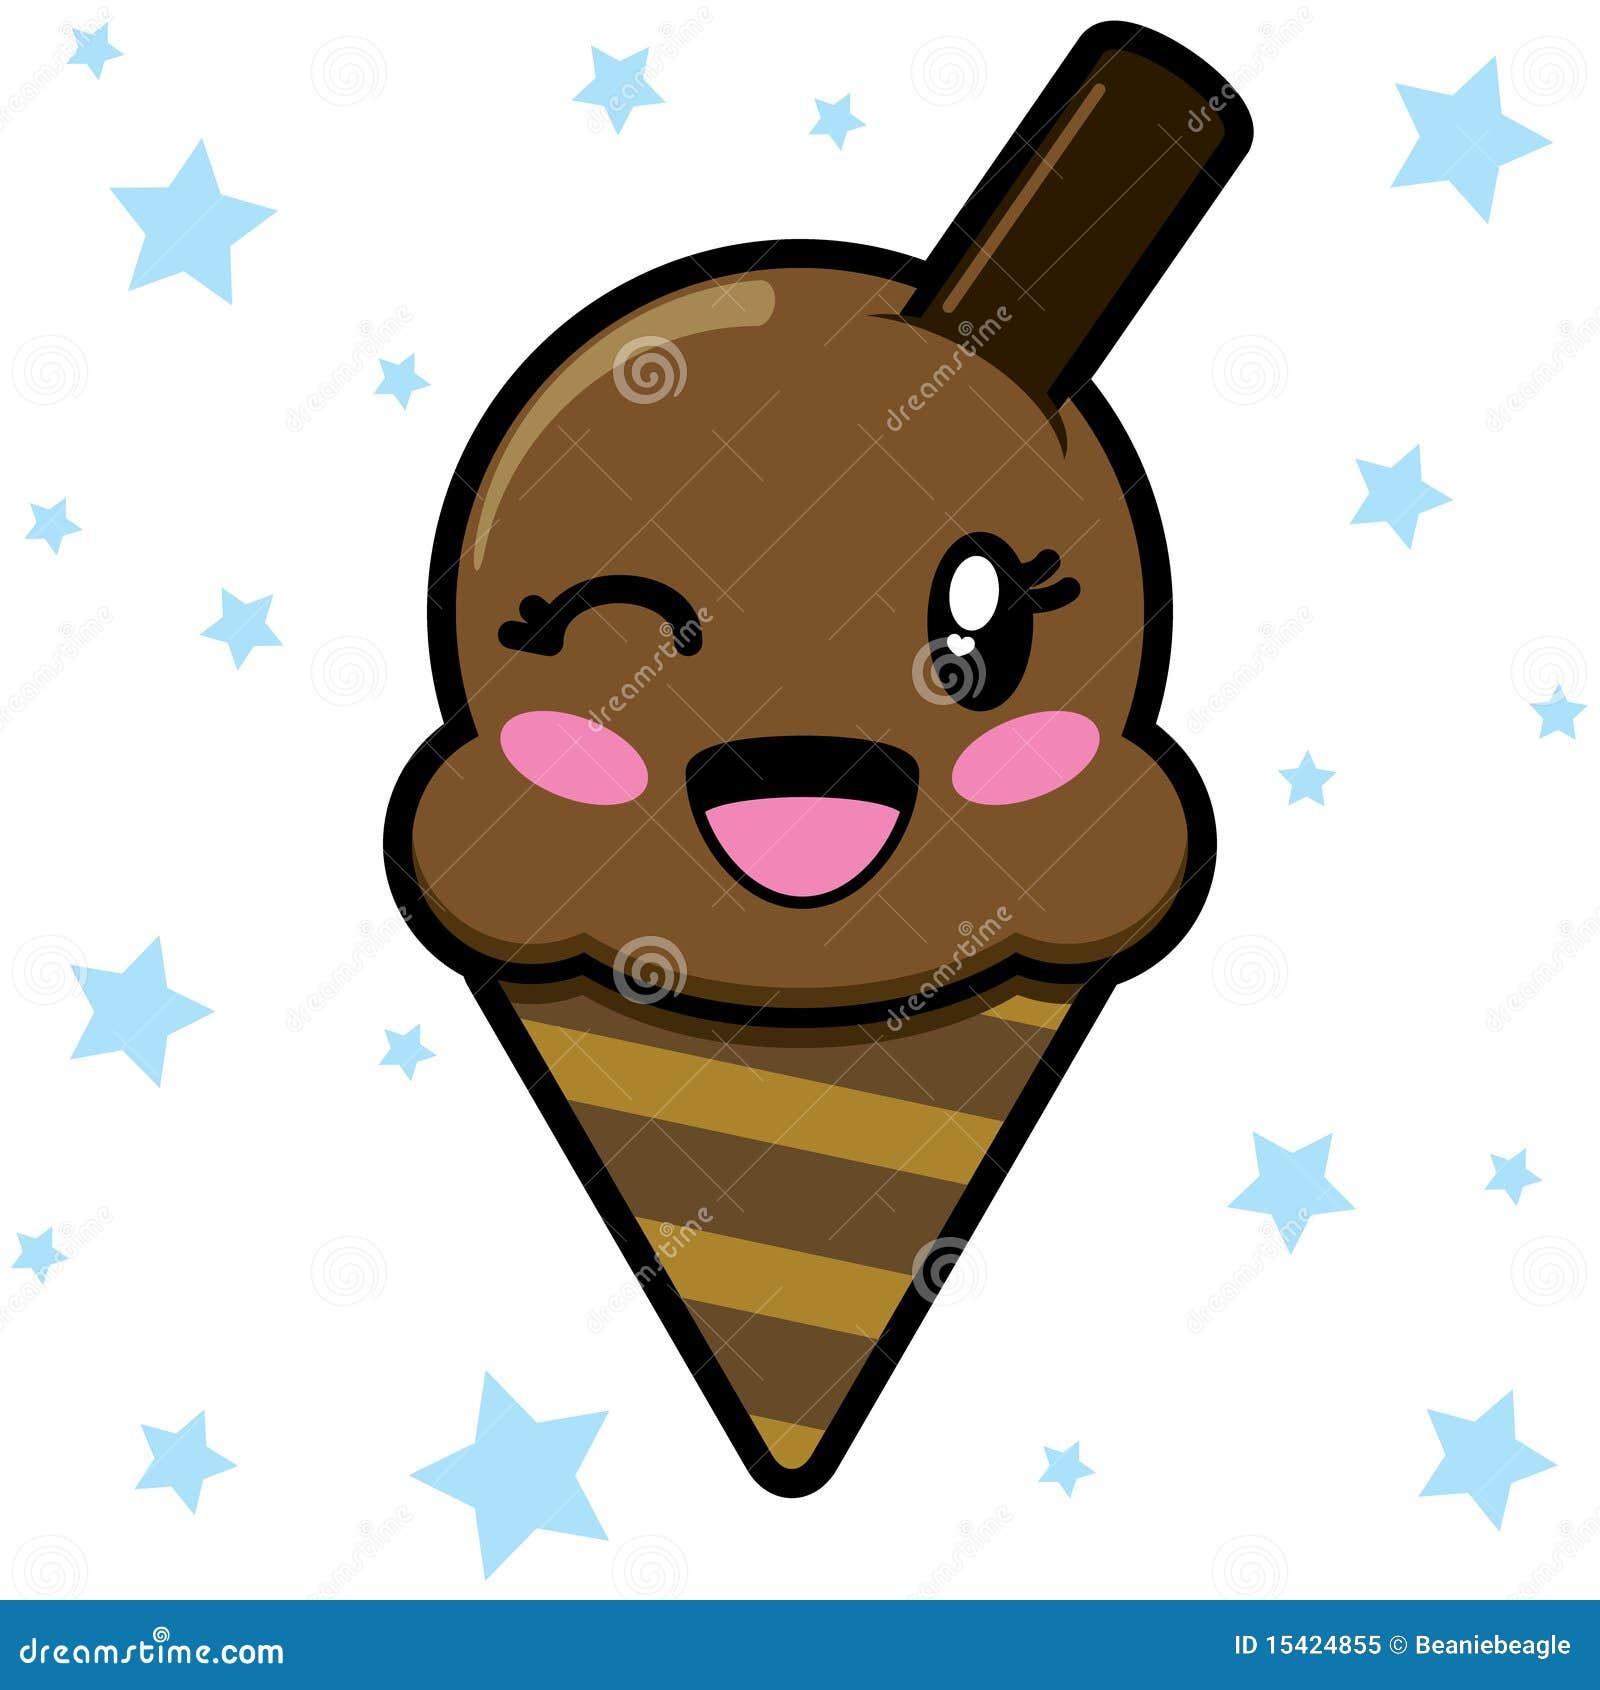 cute chocolate ice cream eps royalty free stock photo Love Smiley Face Clip Art Flower Smiley Face Clip Art